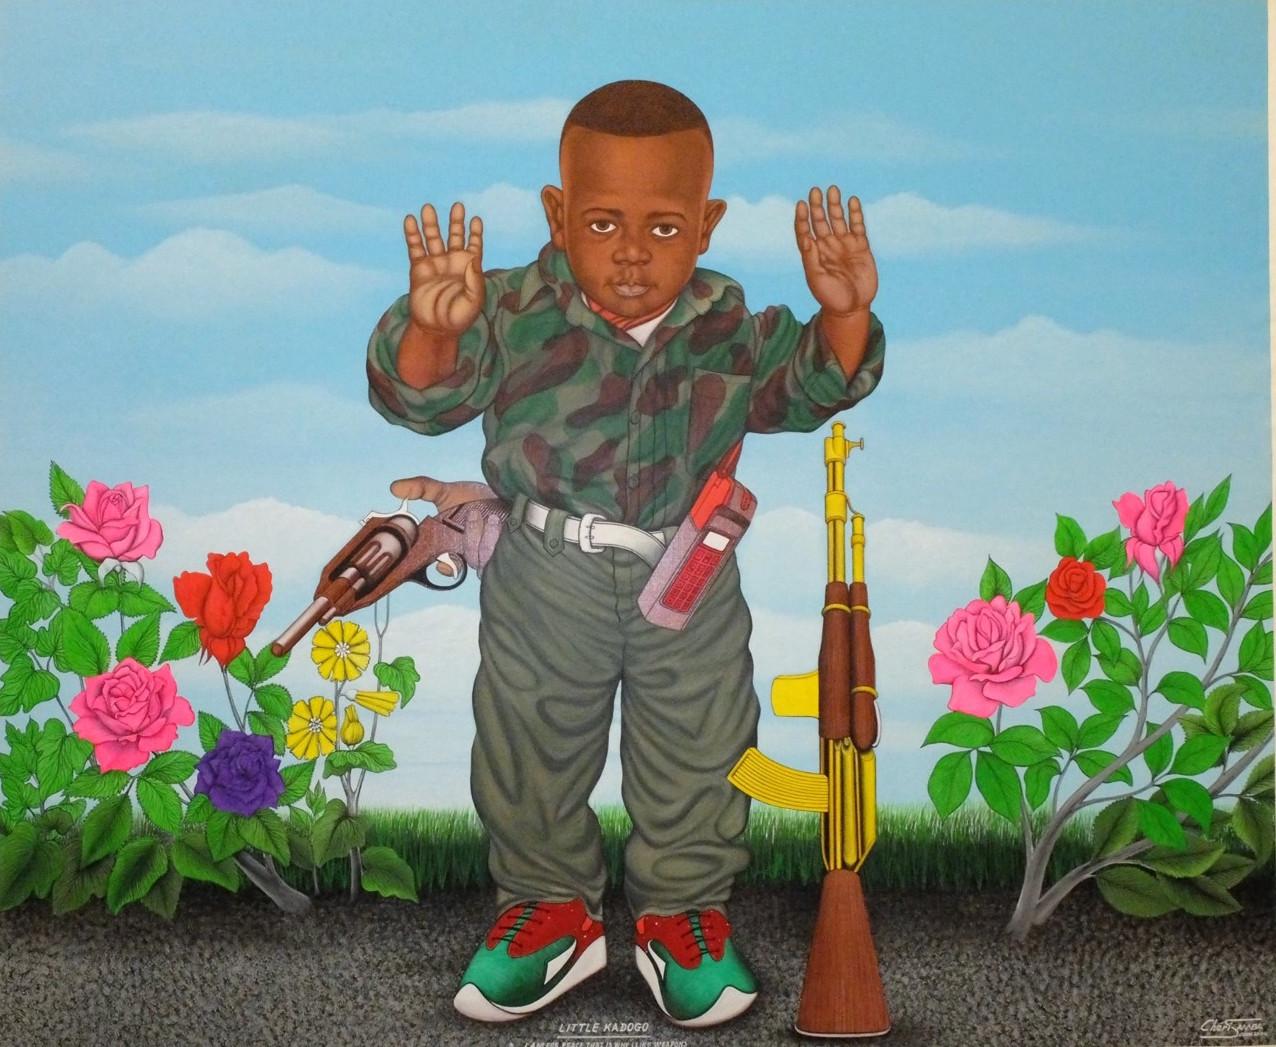 expo_congo_fondation-cartier_peinture-enfant-soldat_cheri-samba.jpg